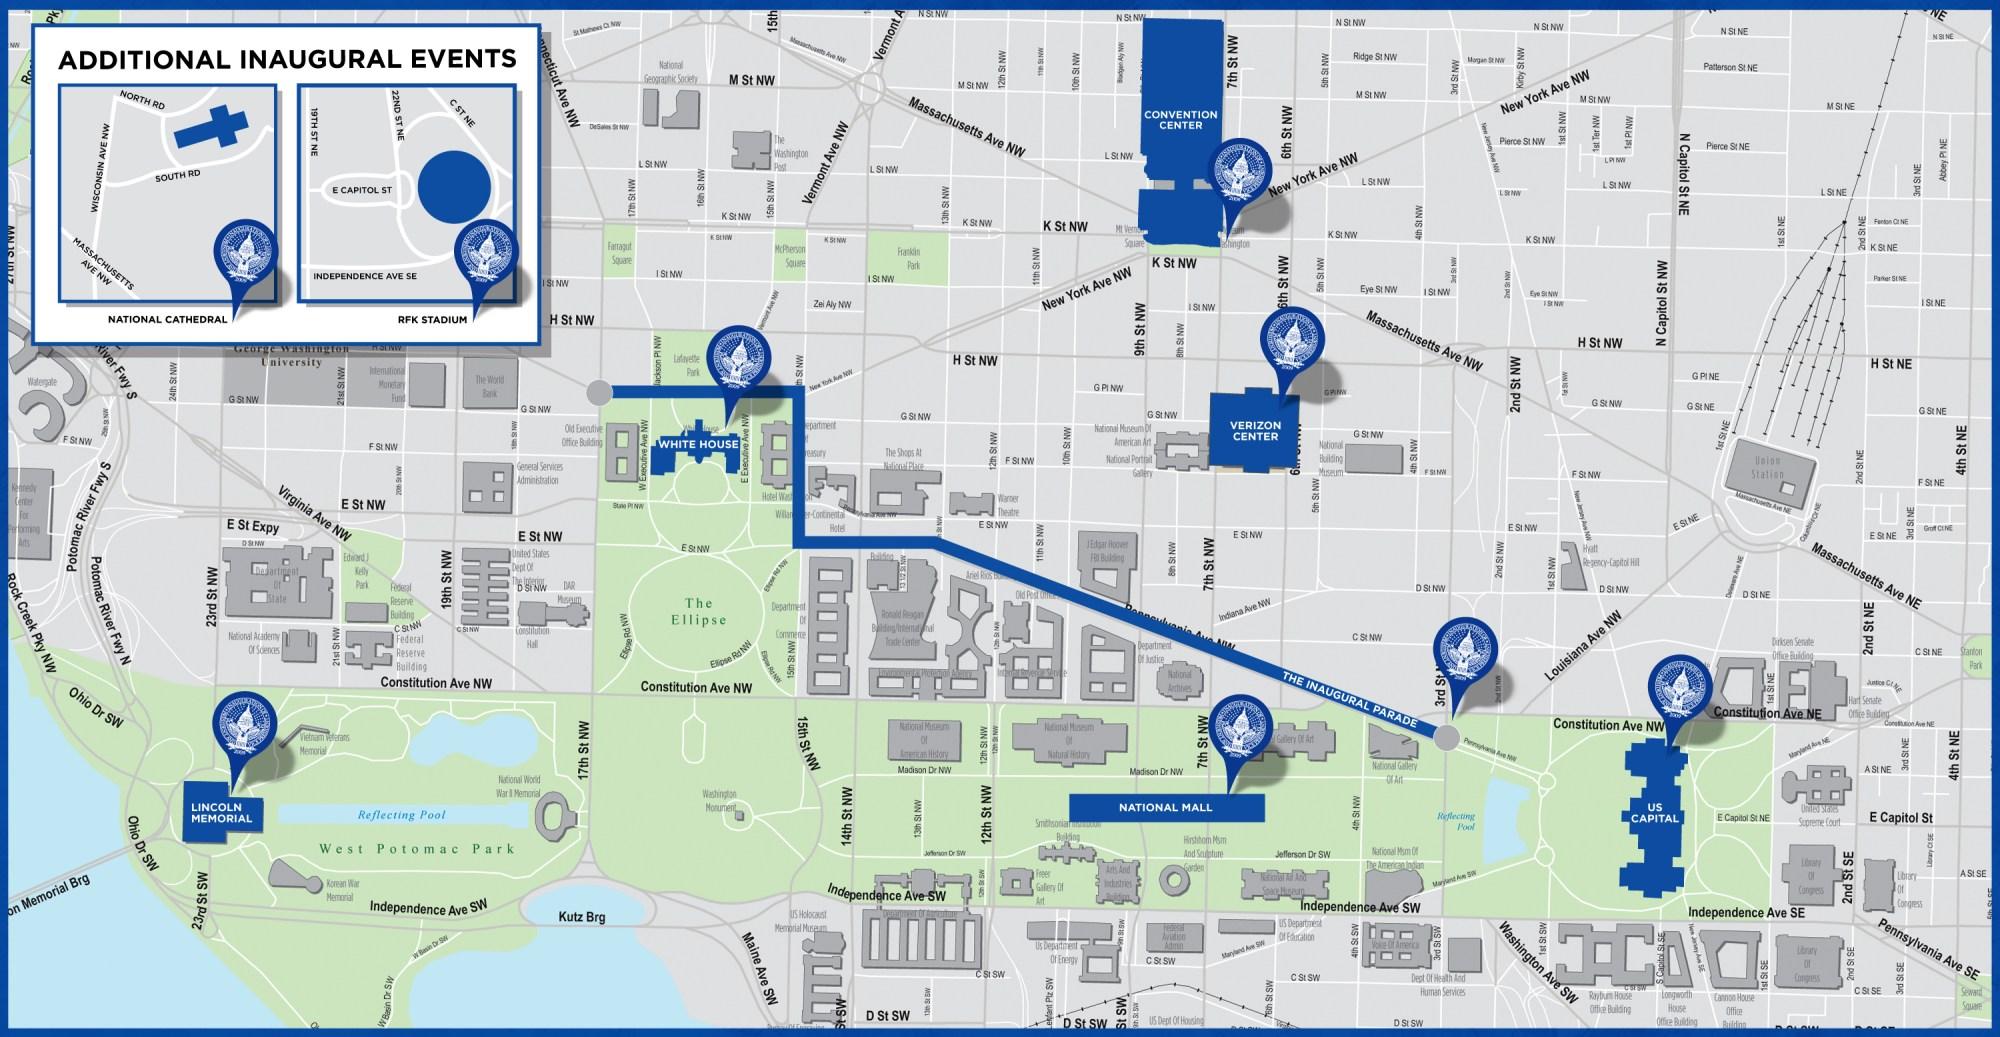 hight resolution of washington d c tourist map see map details from rushprnews com